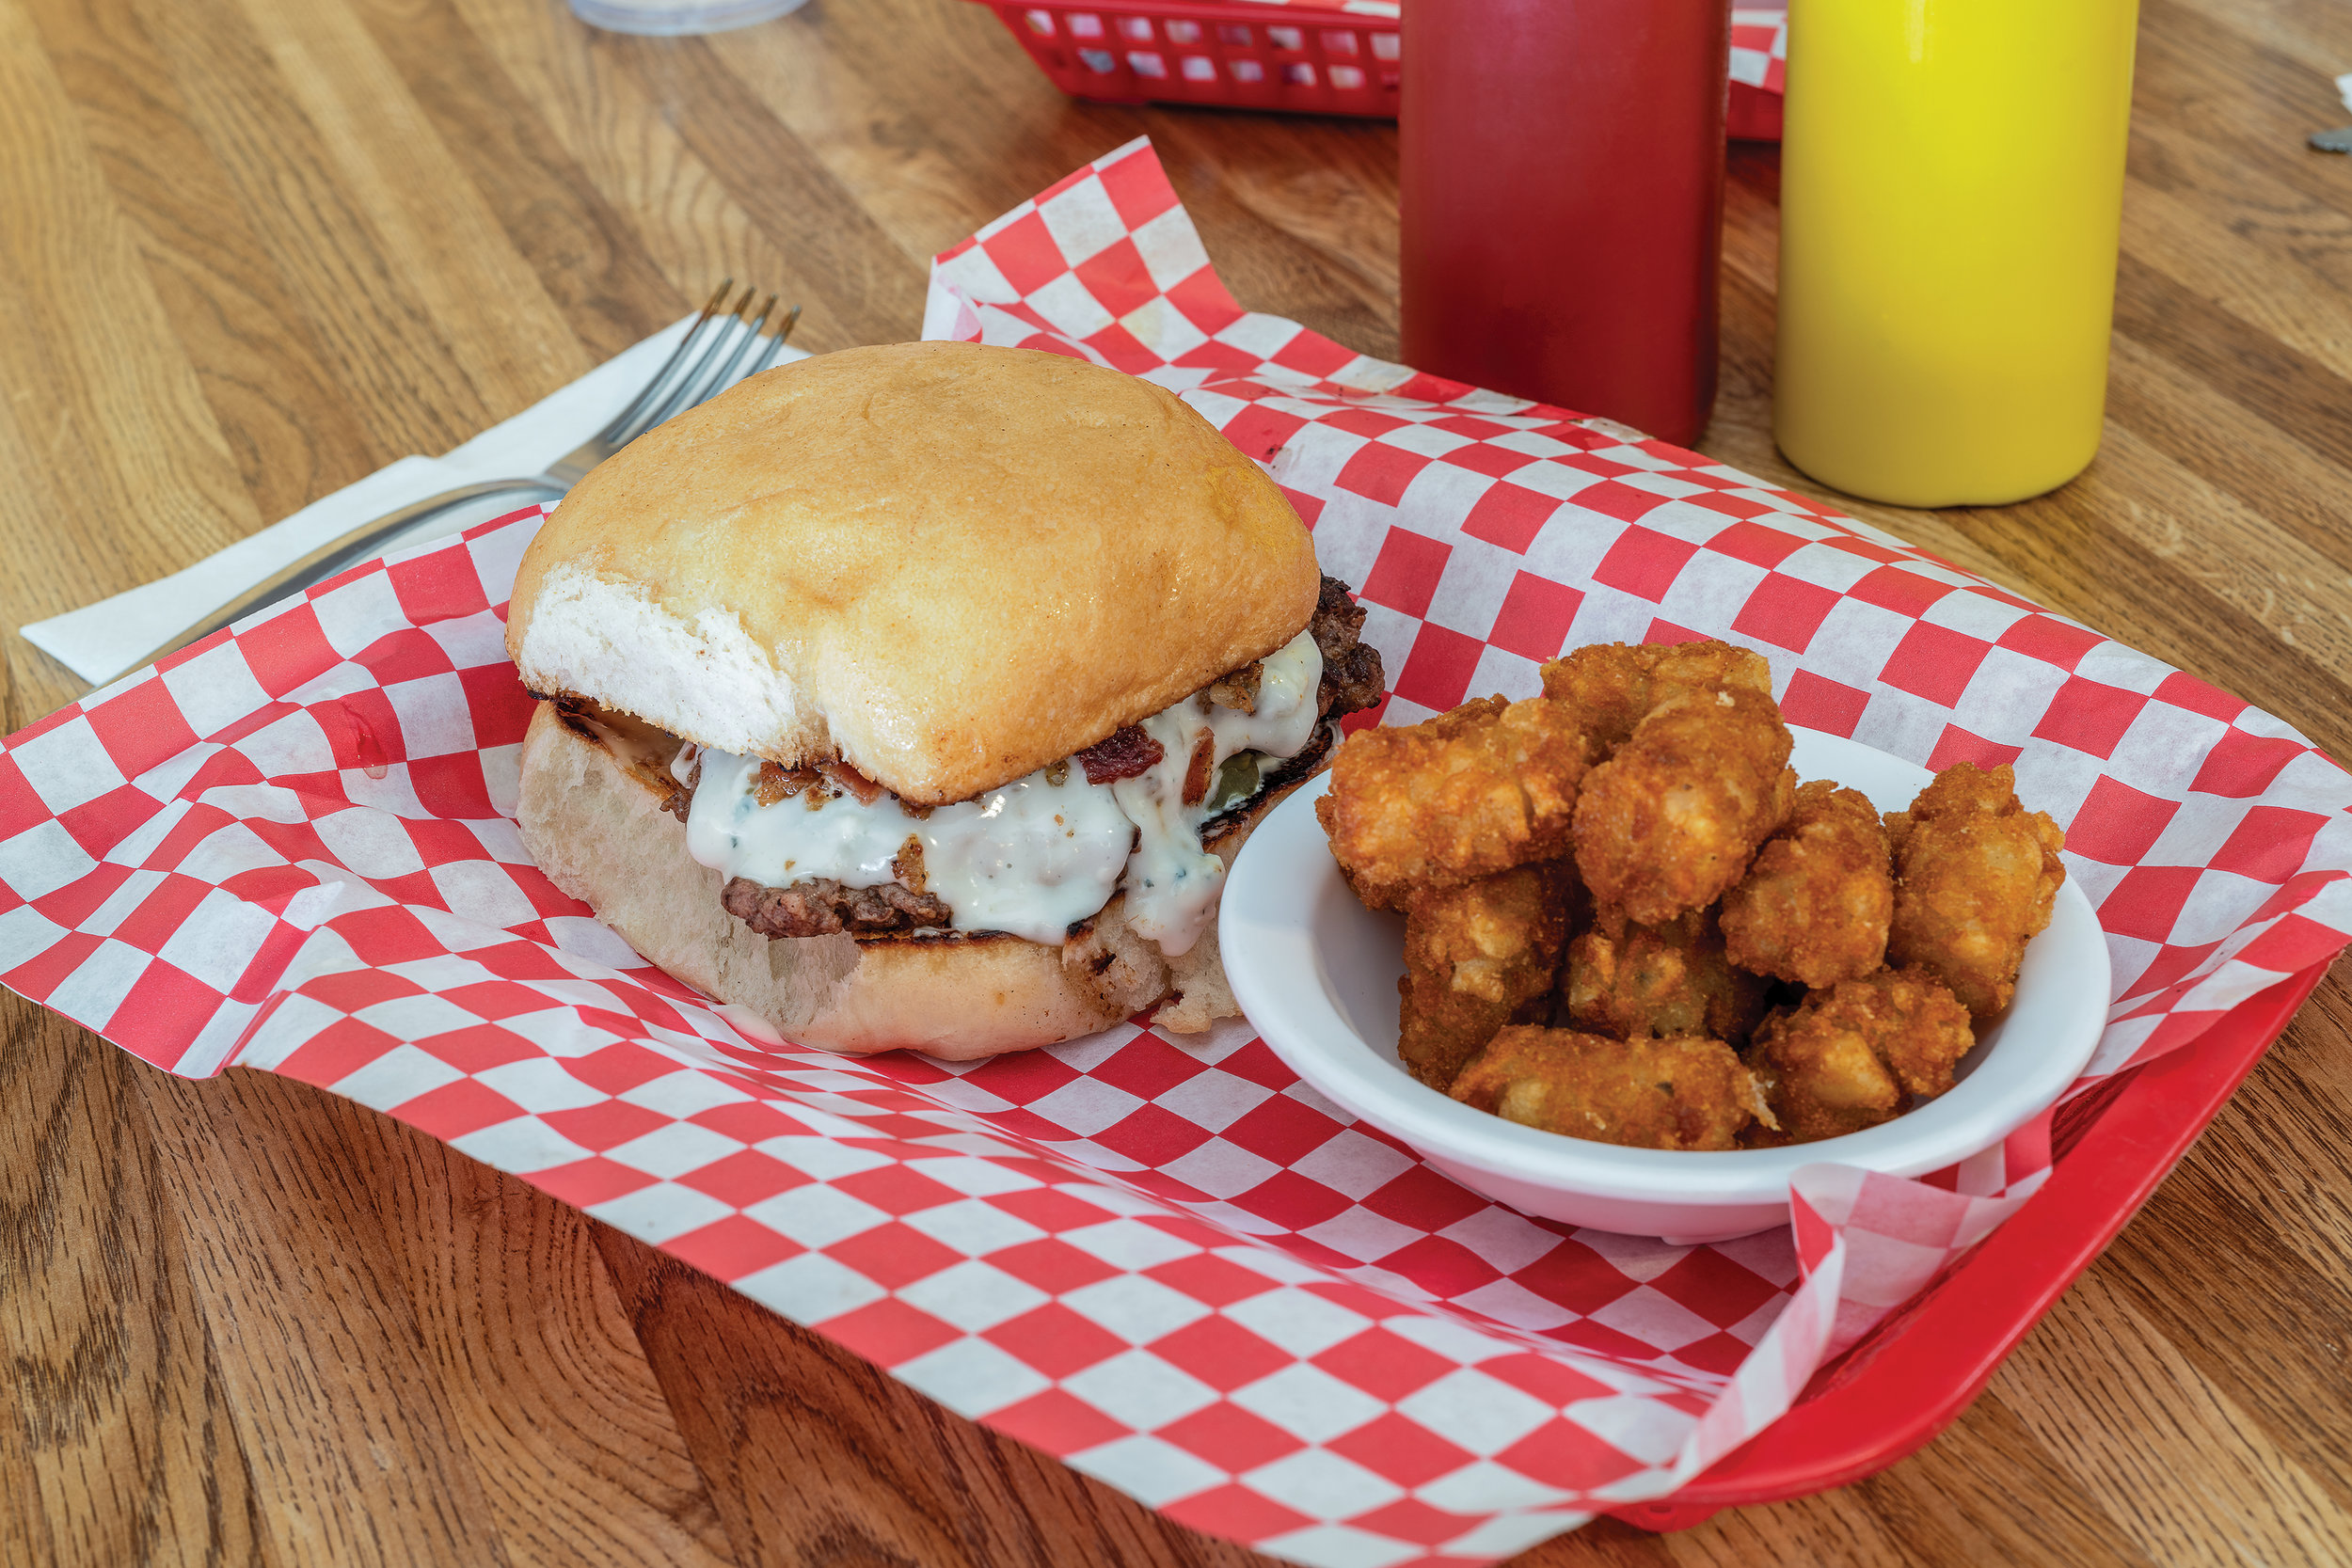 Bacon and Bleu cheeseburger with tater tots